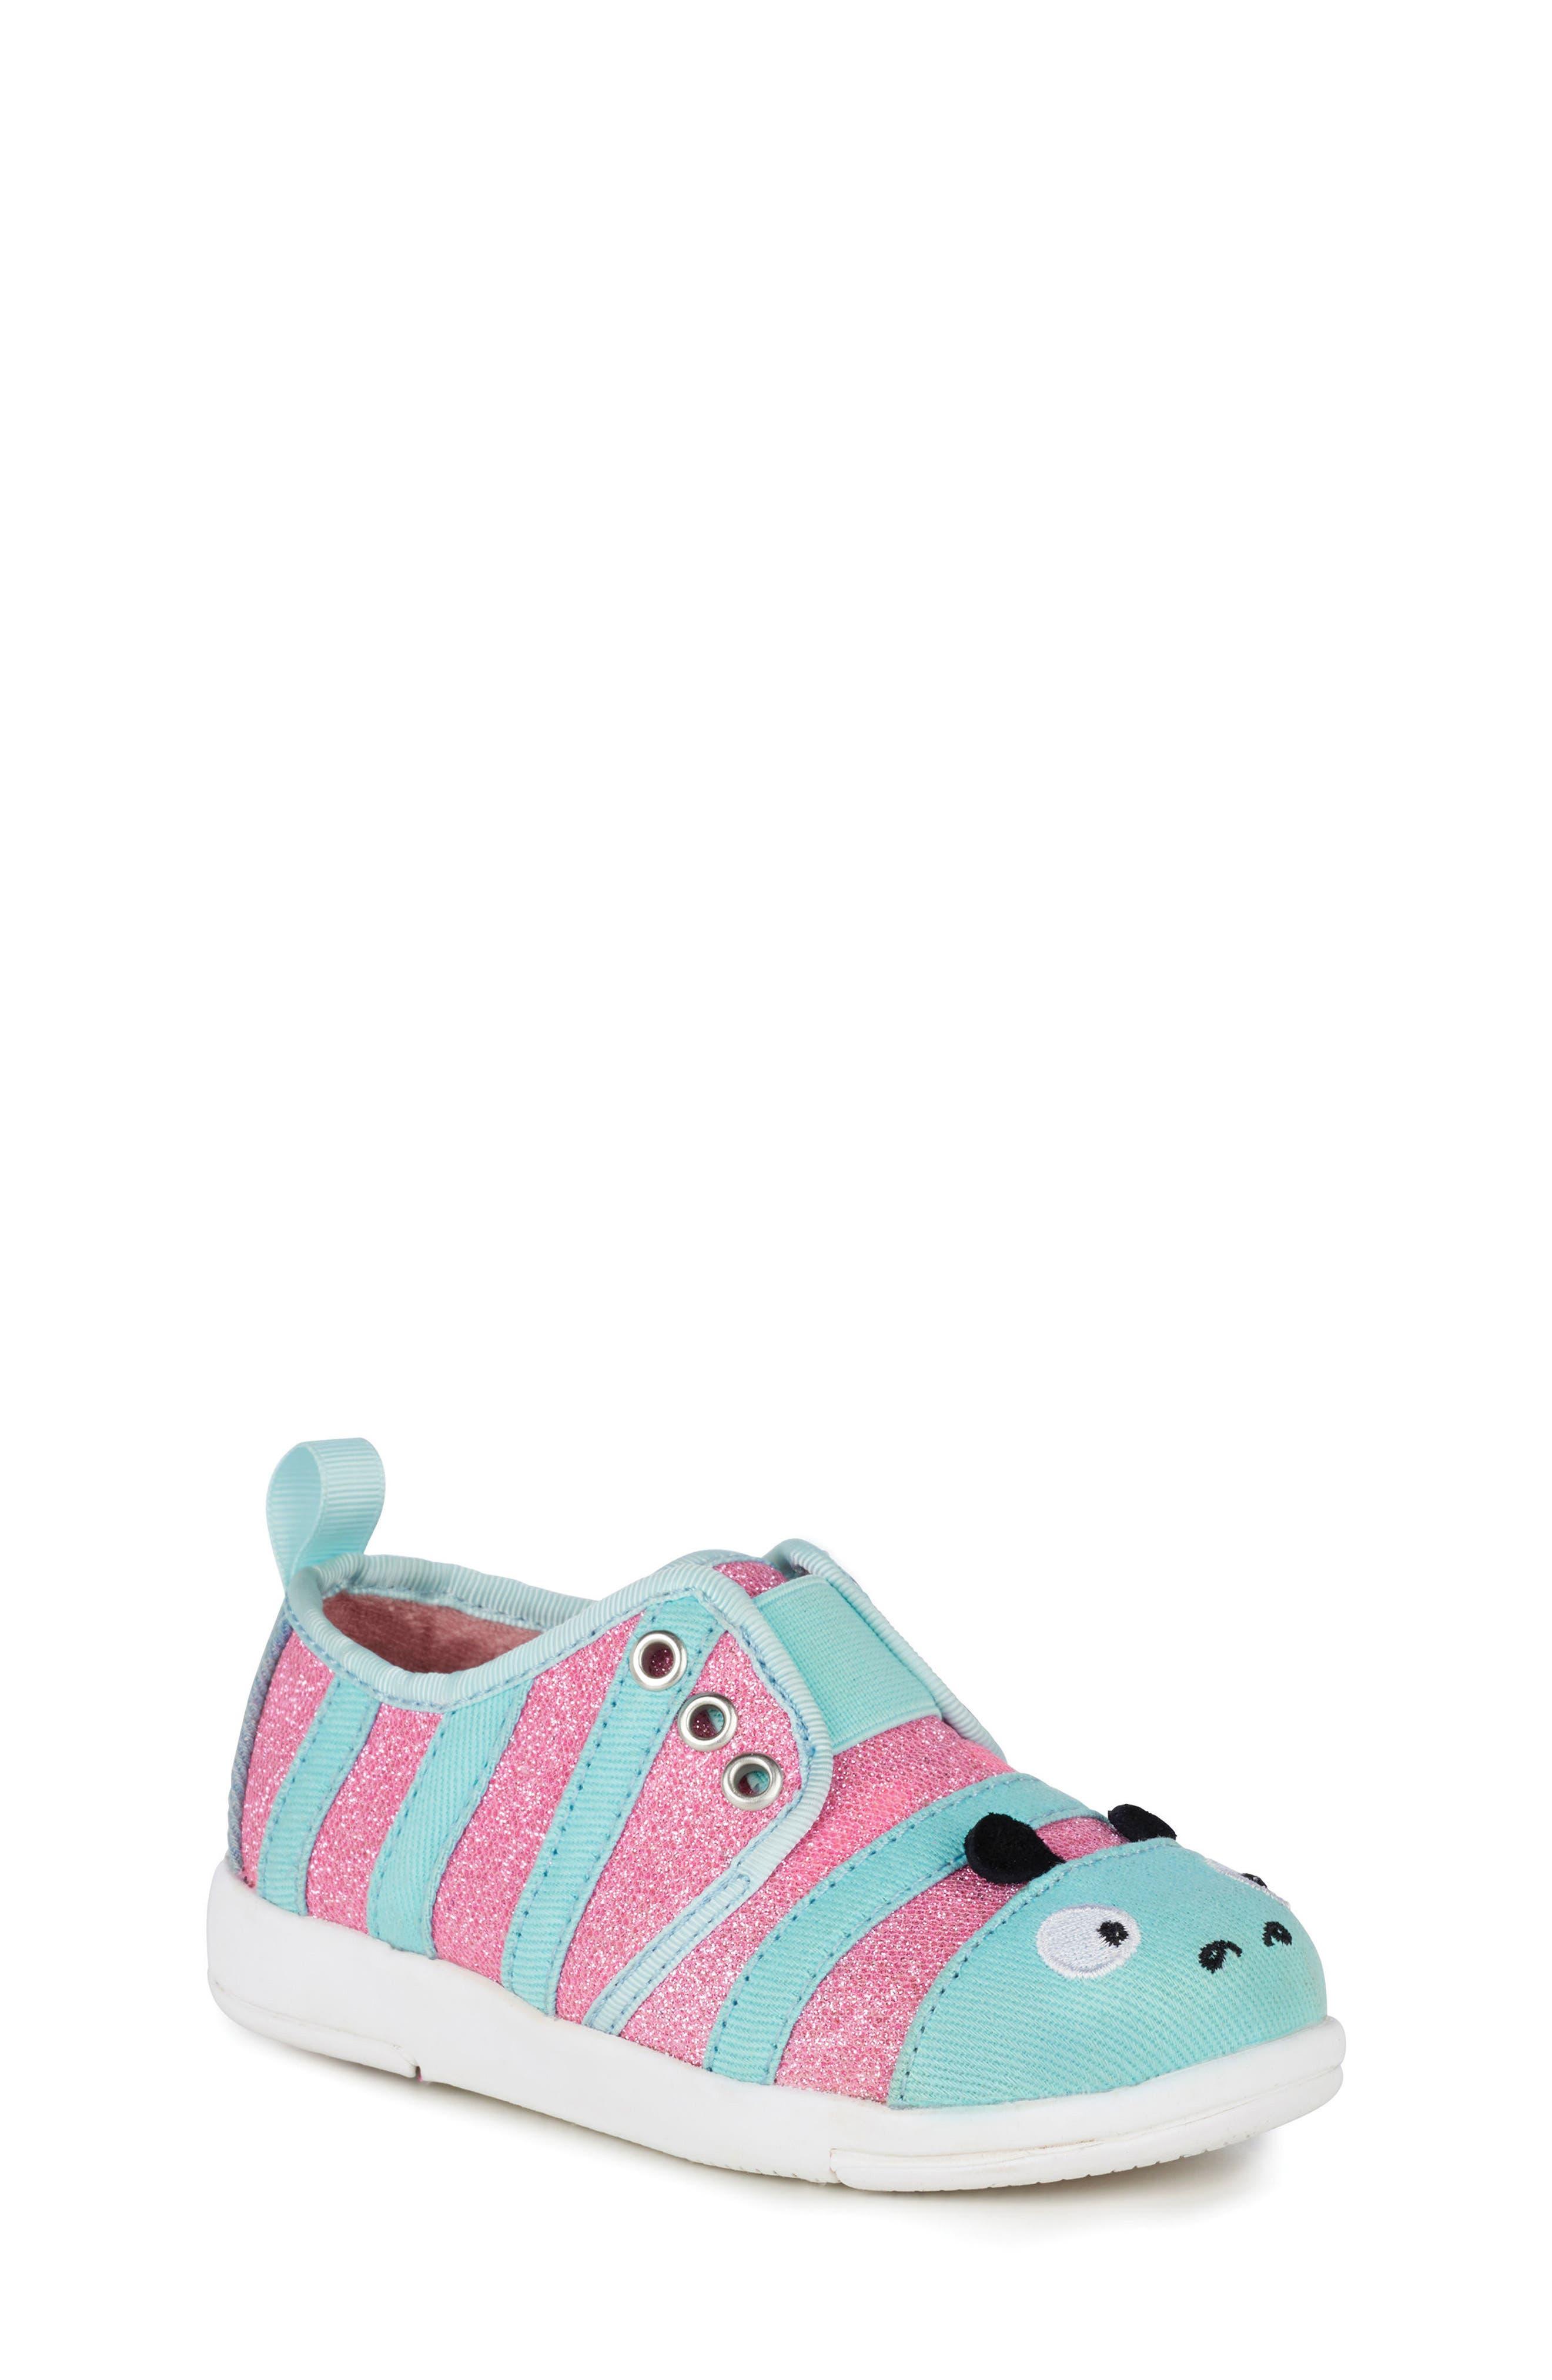 EMU Australia Caterpillar Laceless Sneaker (Toddler, Little Kid & Big Kid)